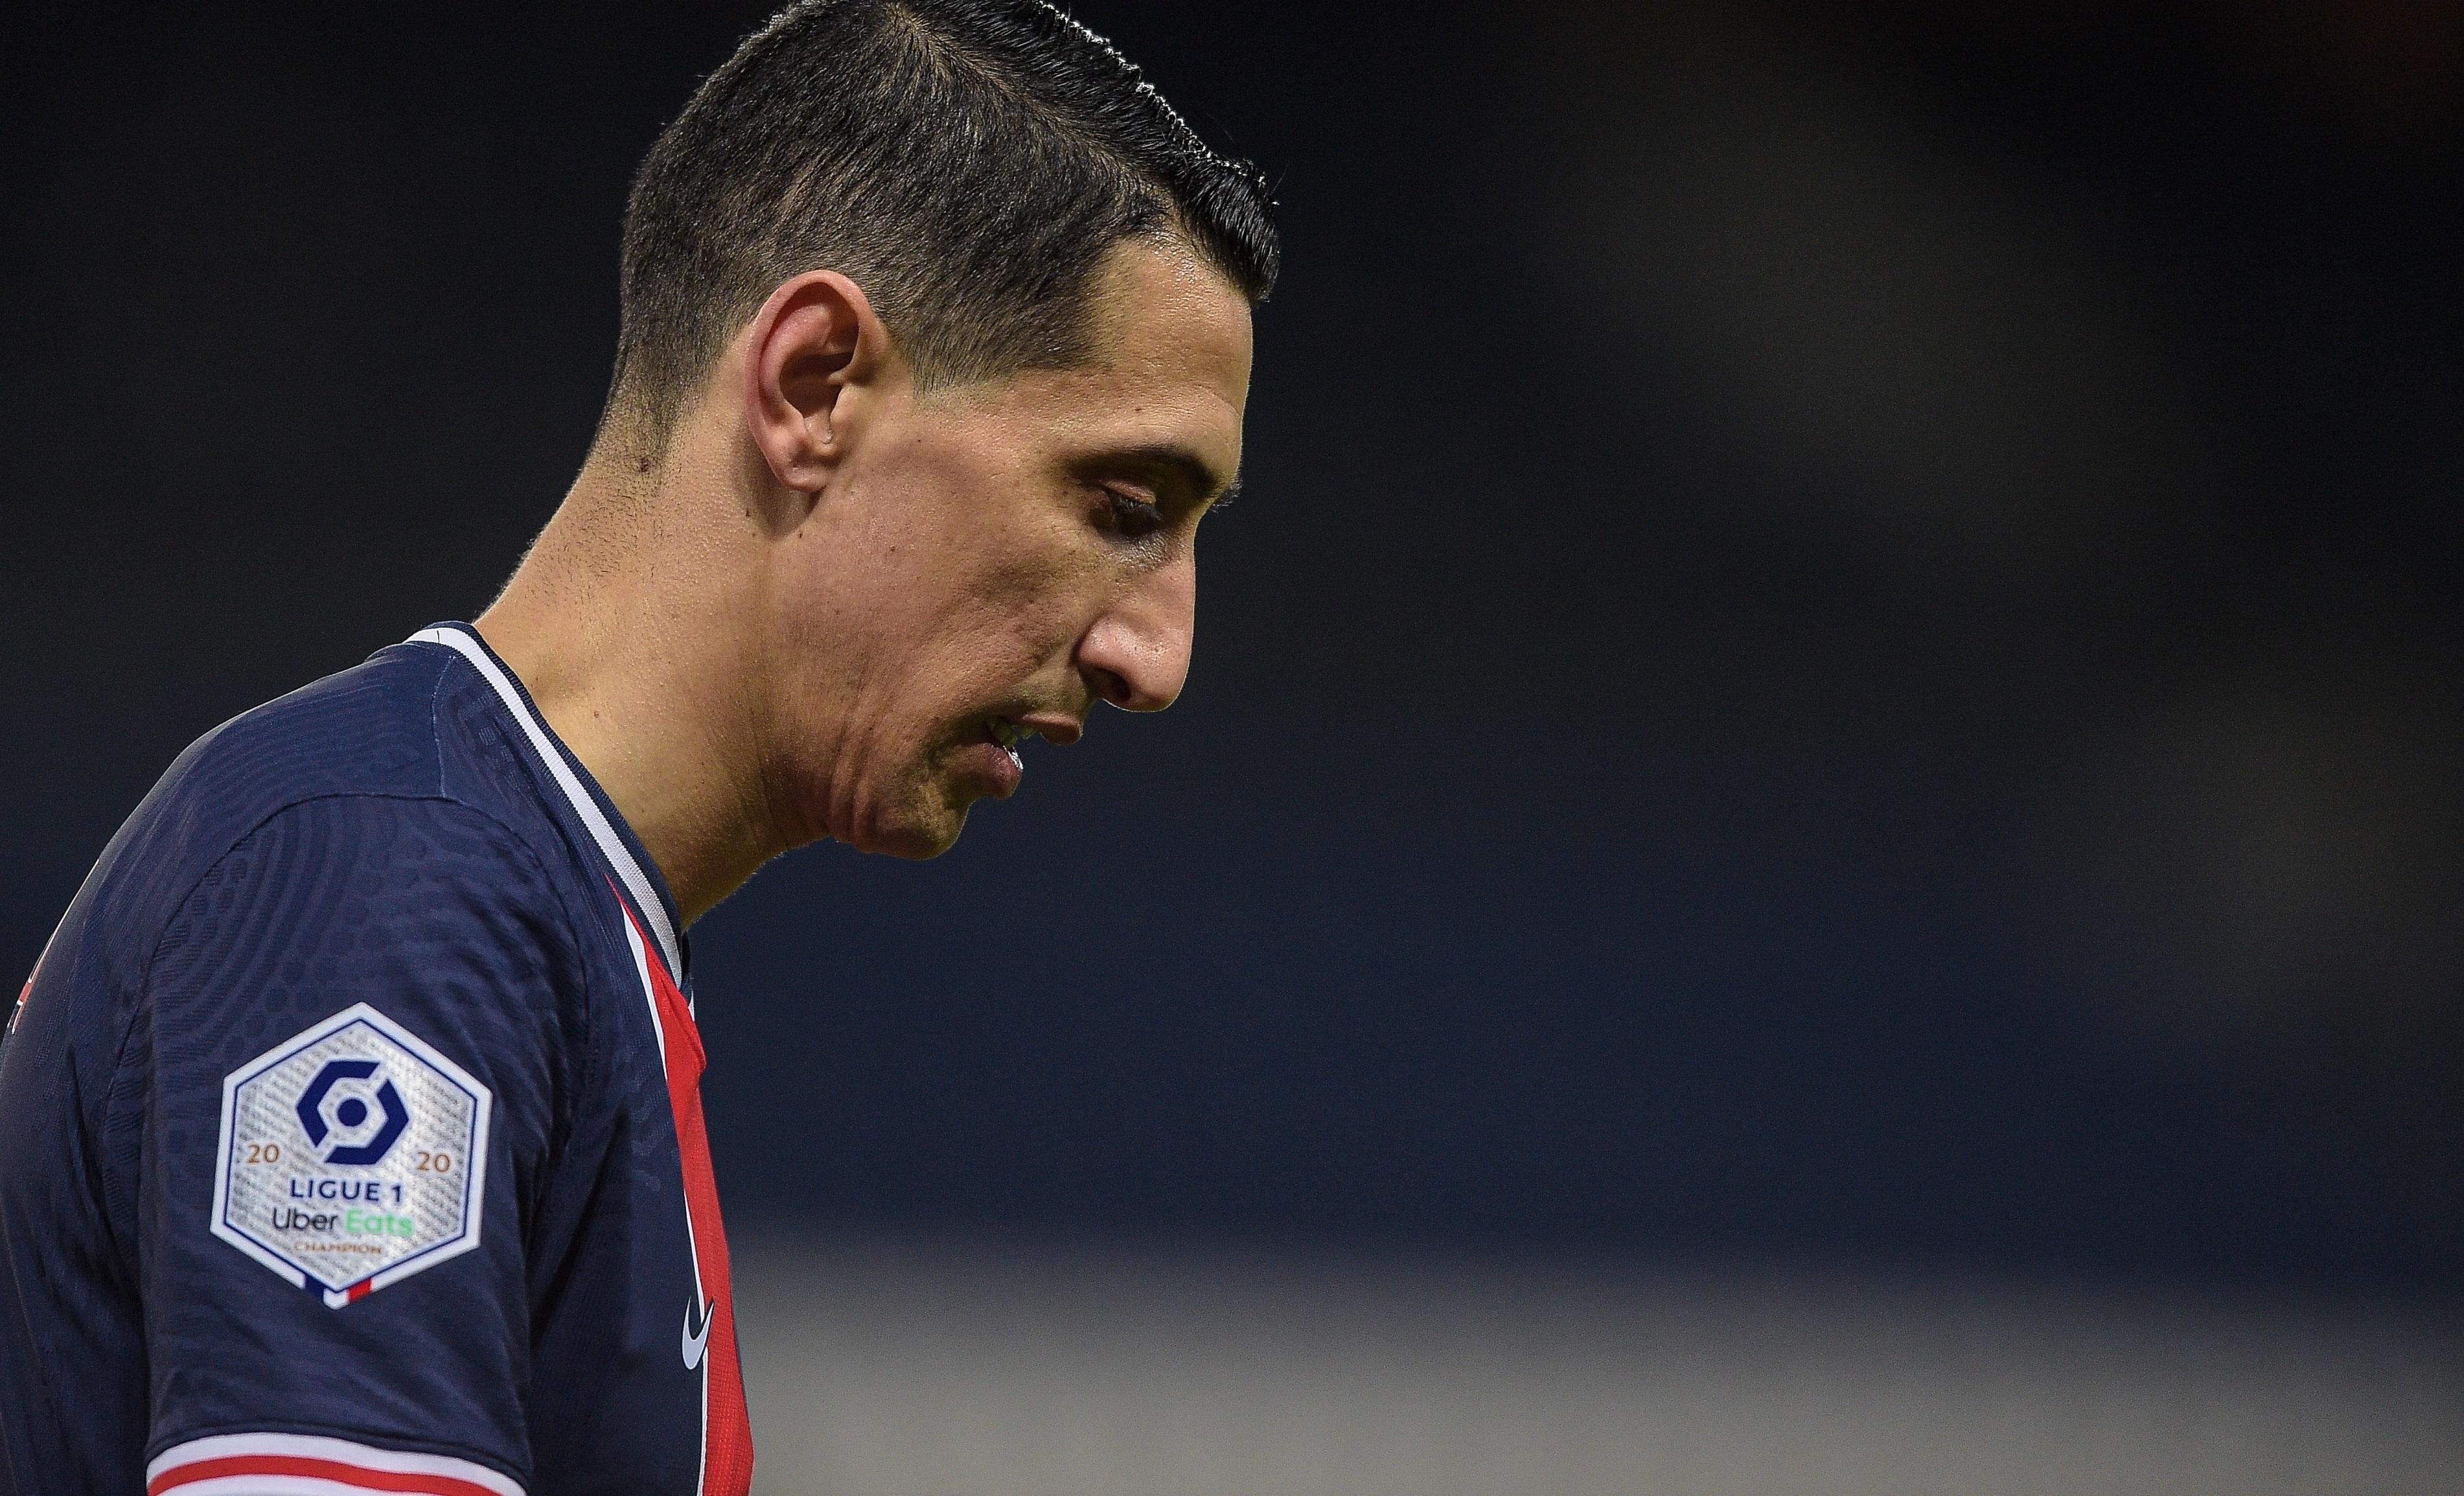 PSG-Nantes (1-2) : Le domicile de Di Maria cambriolé en plein match !